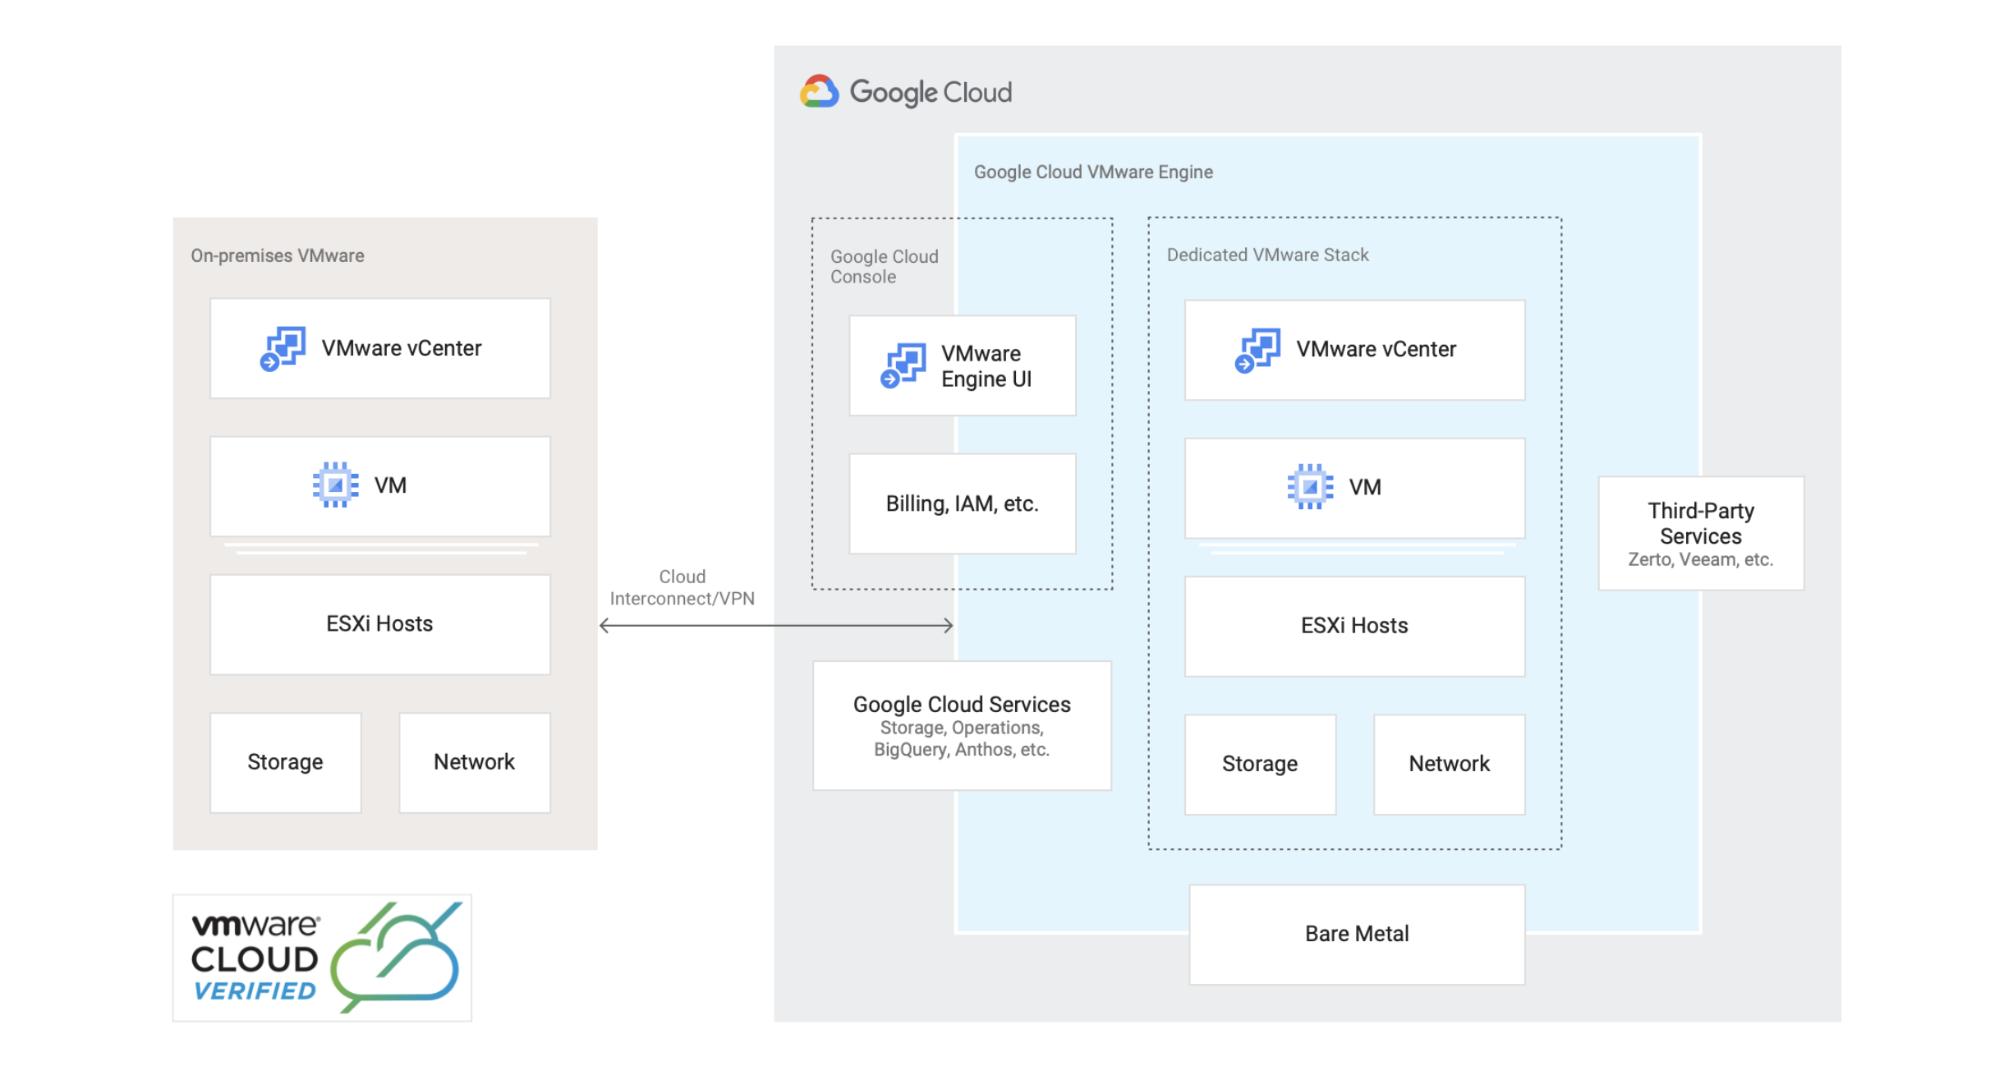 VMware 環境を Google Cloud に移行または拡張する方法を示すリファレンス アーキテクチャ。